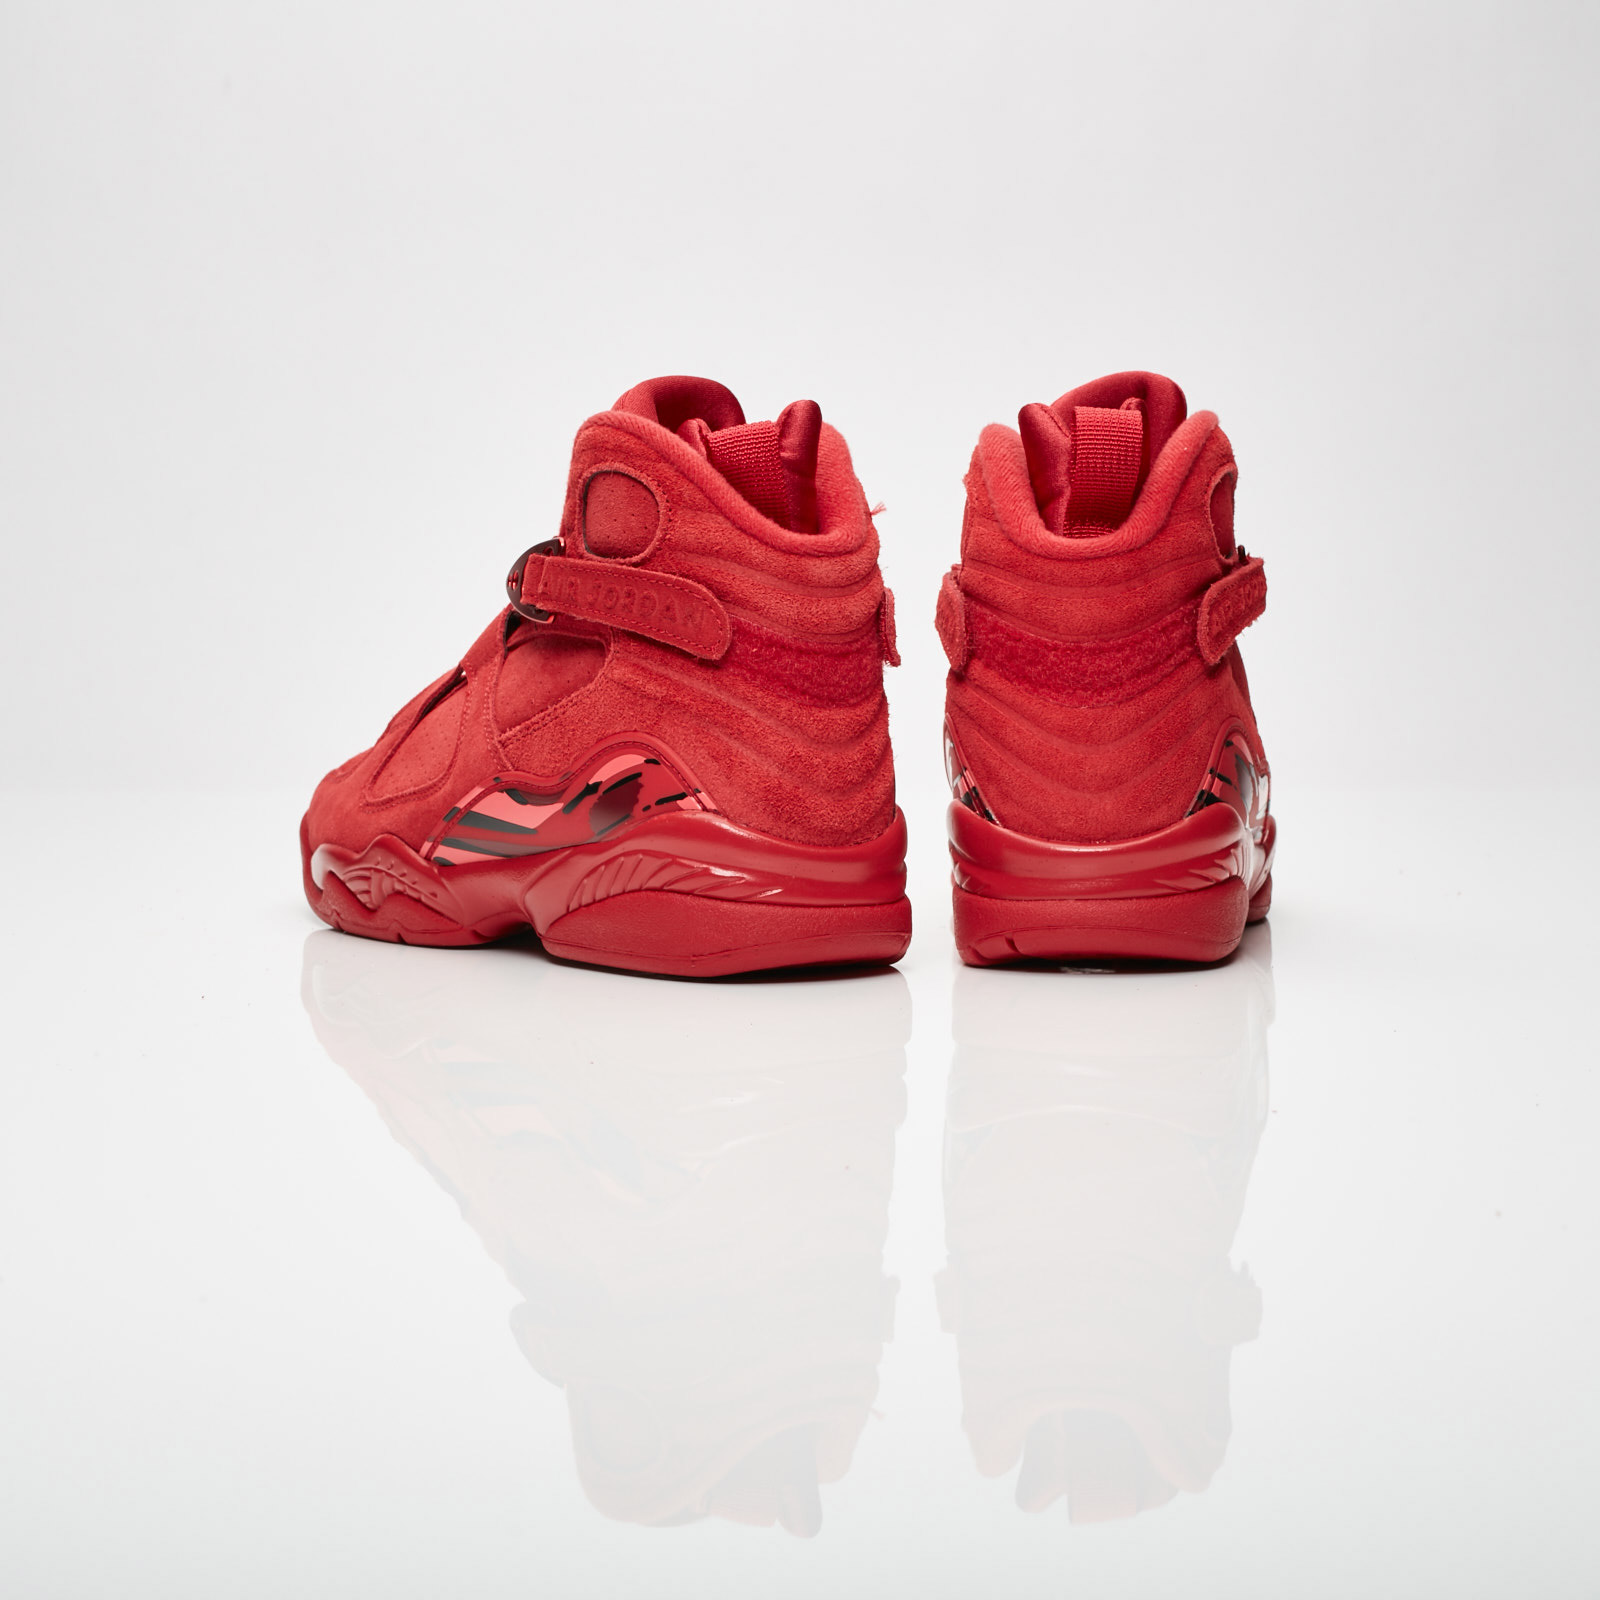 sale retailer 64917 84f94 Jordan Brand Wmns Air Jordan 8 Retro Valentines Day - Aq2449 ...